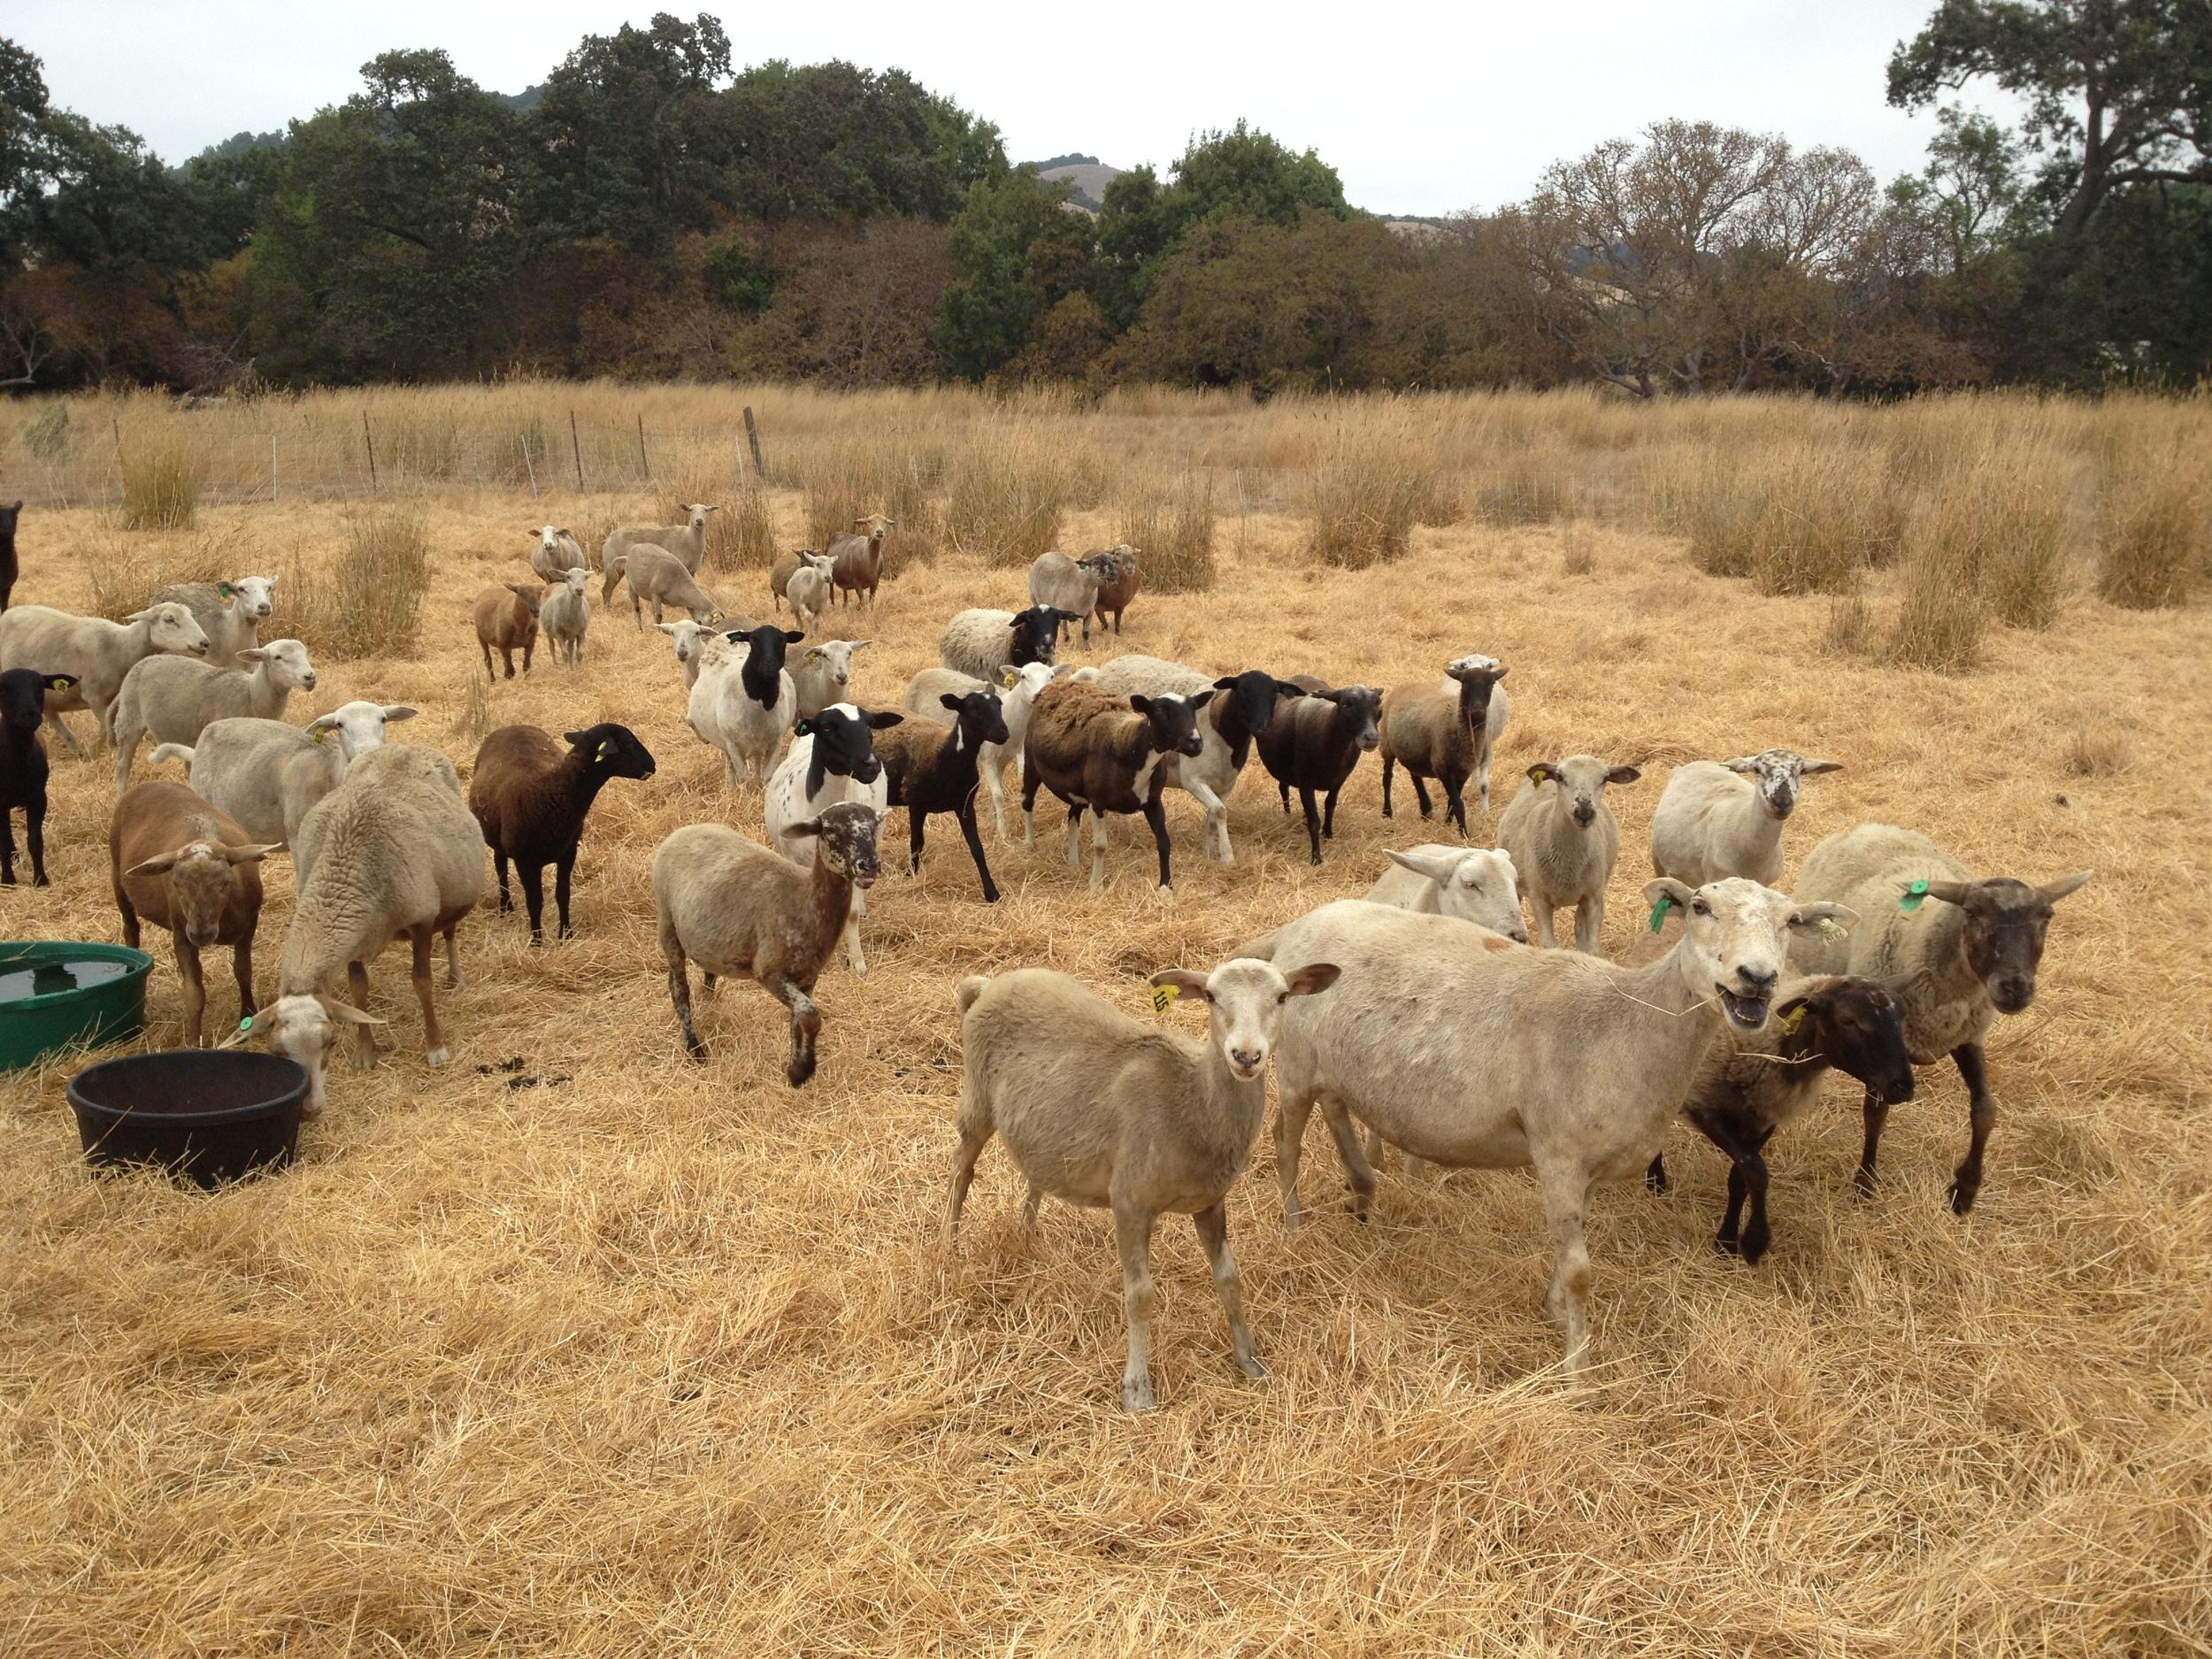 Sheep_dry_grass.JPG